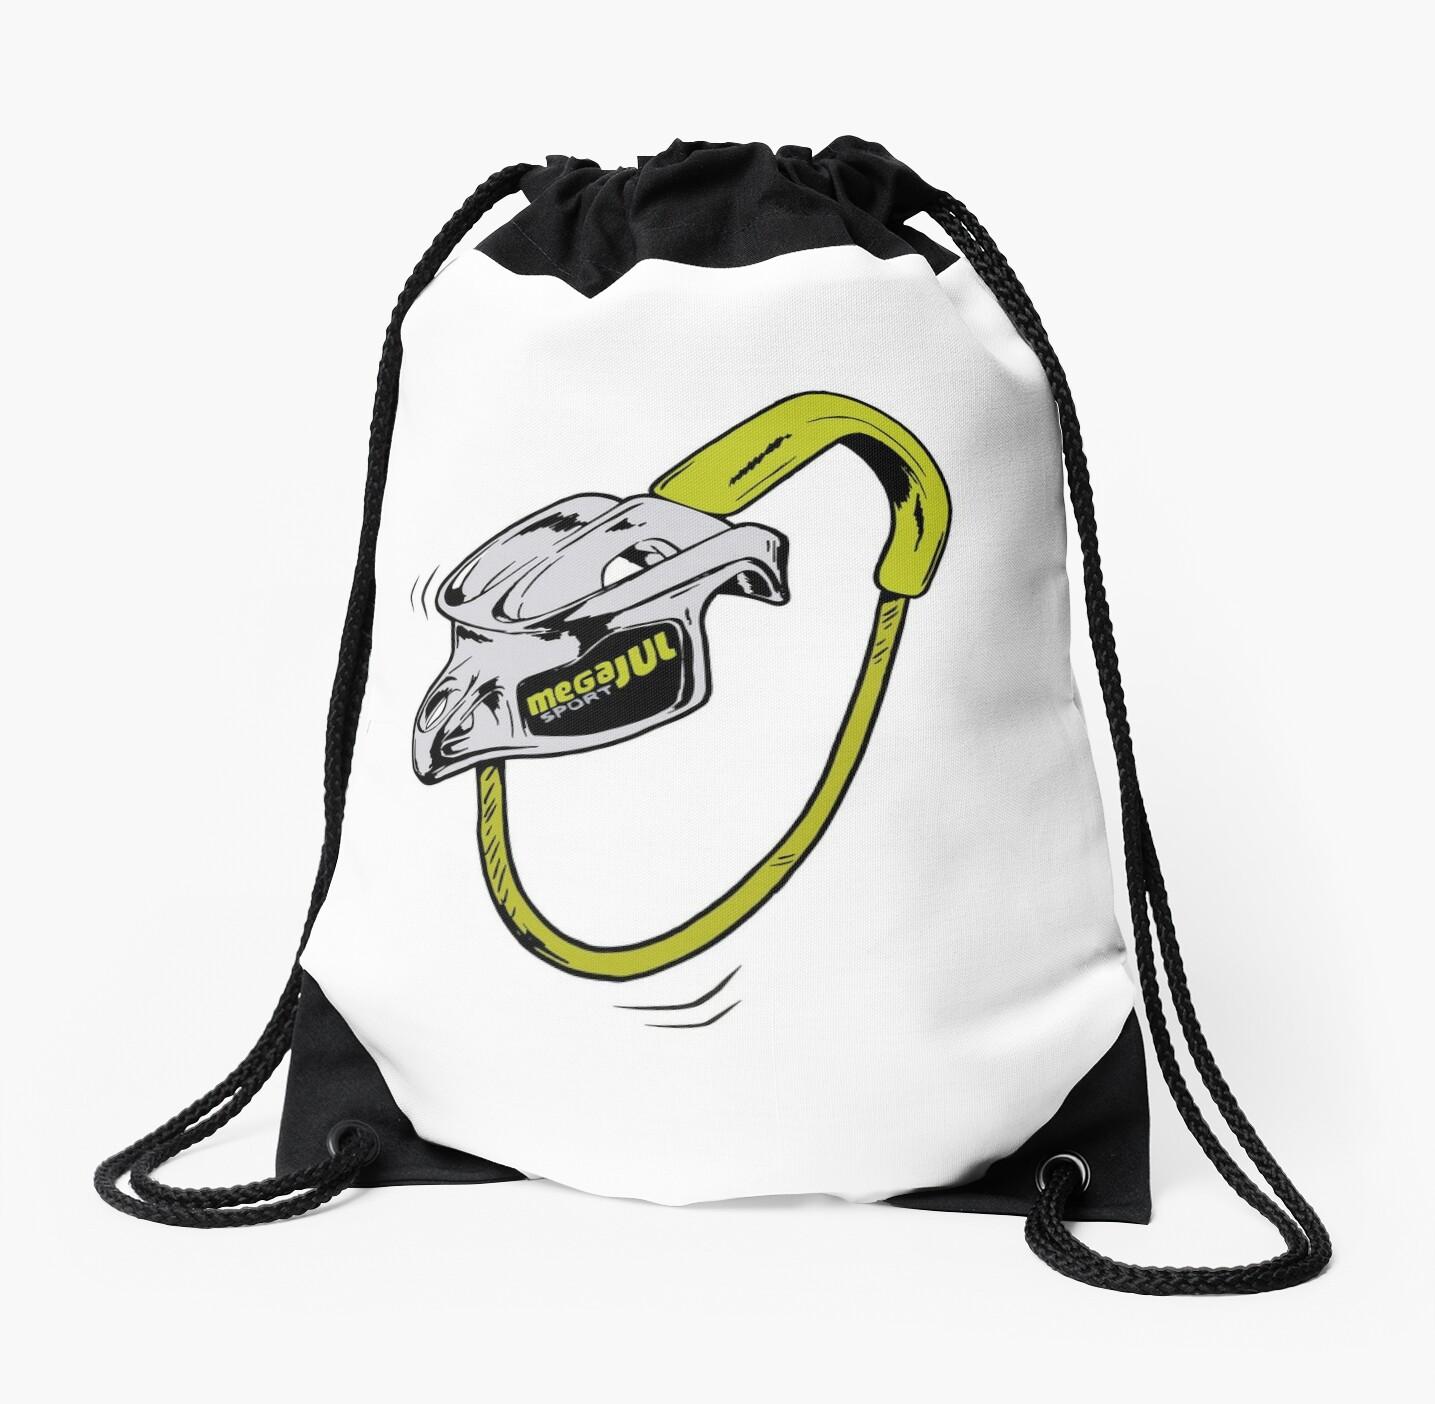 1487a2a8ef06 TTigernu T C6008 DSLR Camera Backpack mega kosovo prishtine. Mega Jul  Edelrid sport belay device climbing bouldering T-shirt by Greyclothing